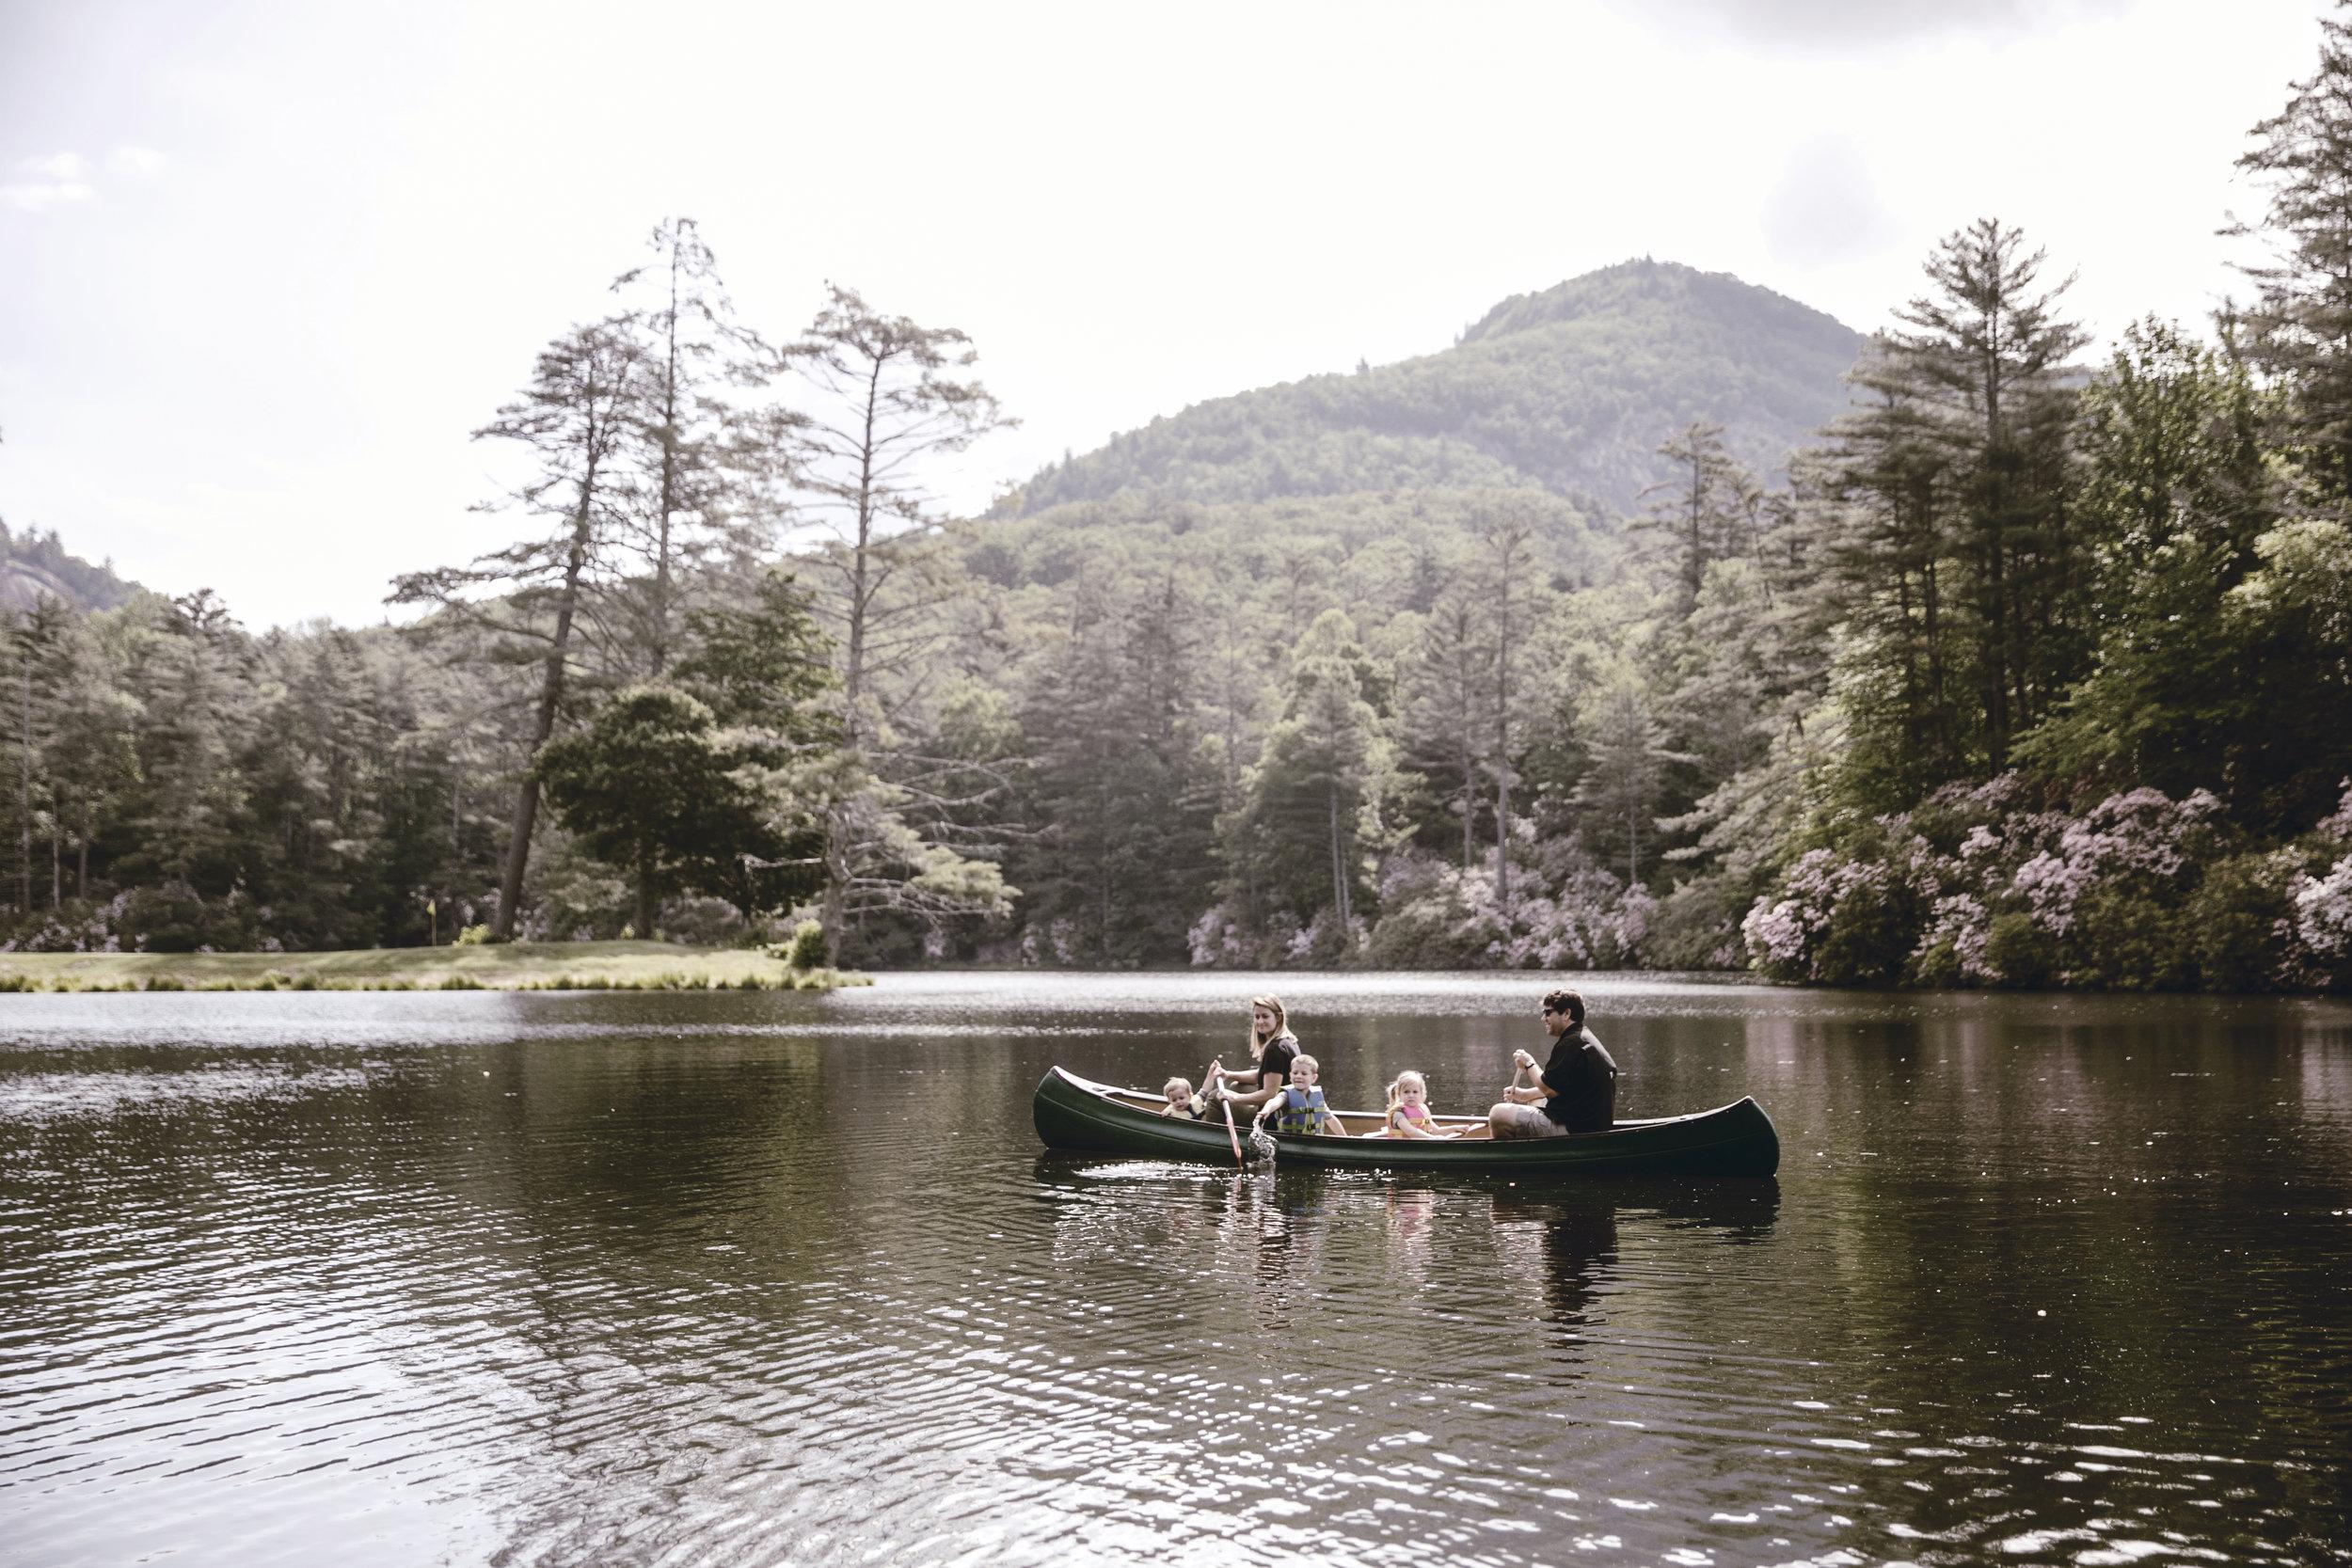 canoeing at high Hampton inn / heirloomed